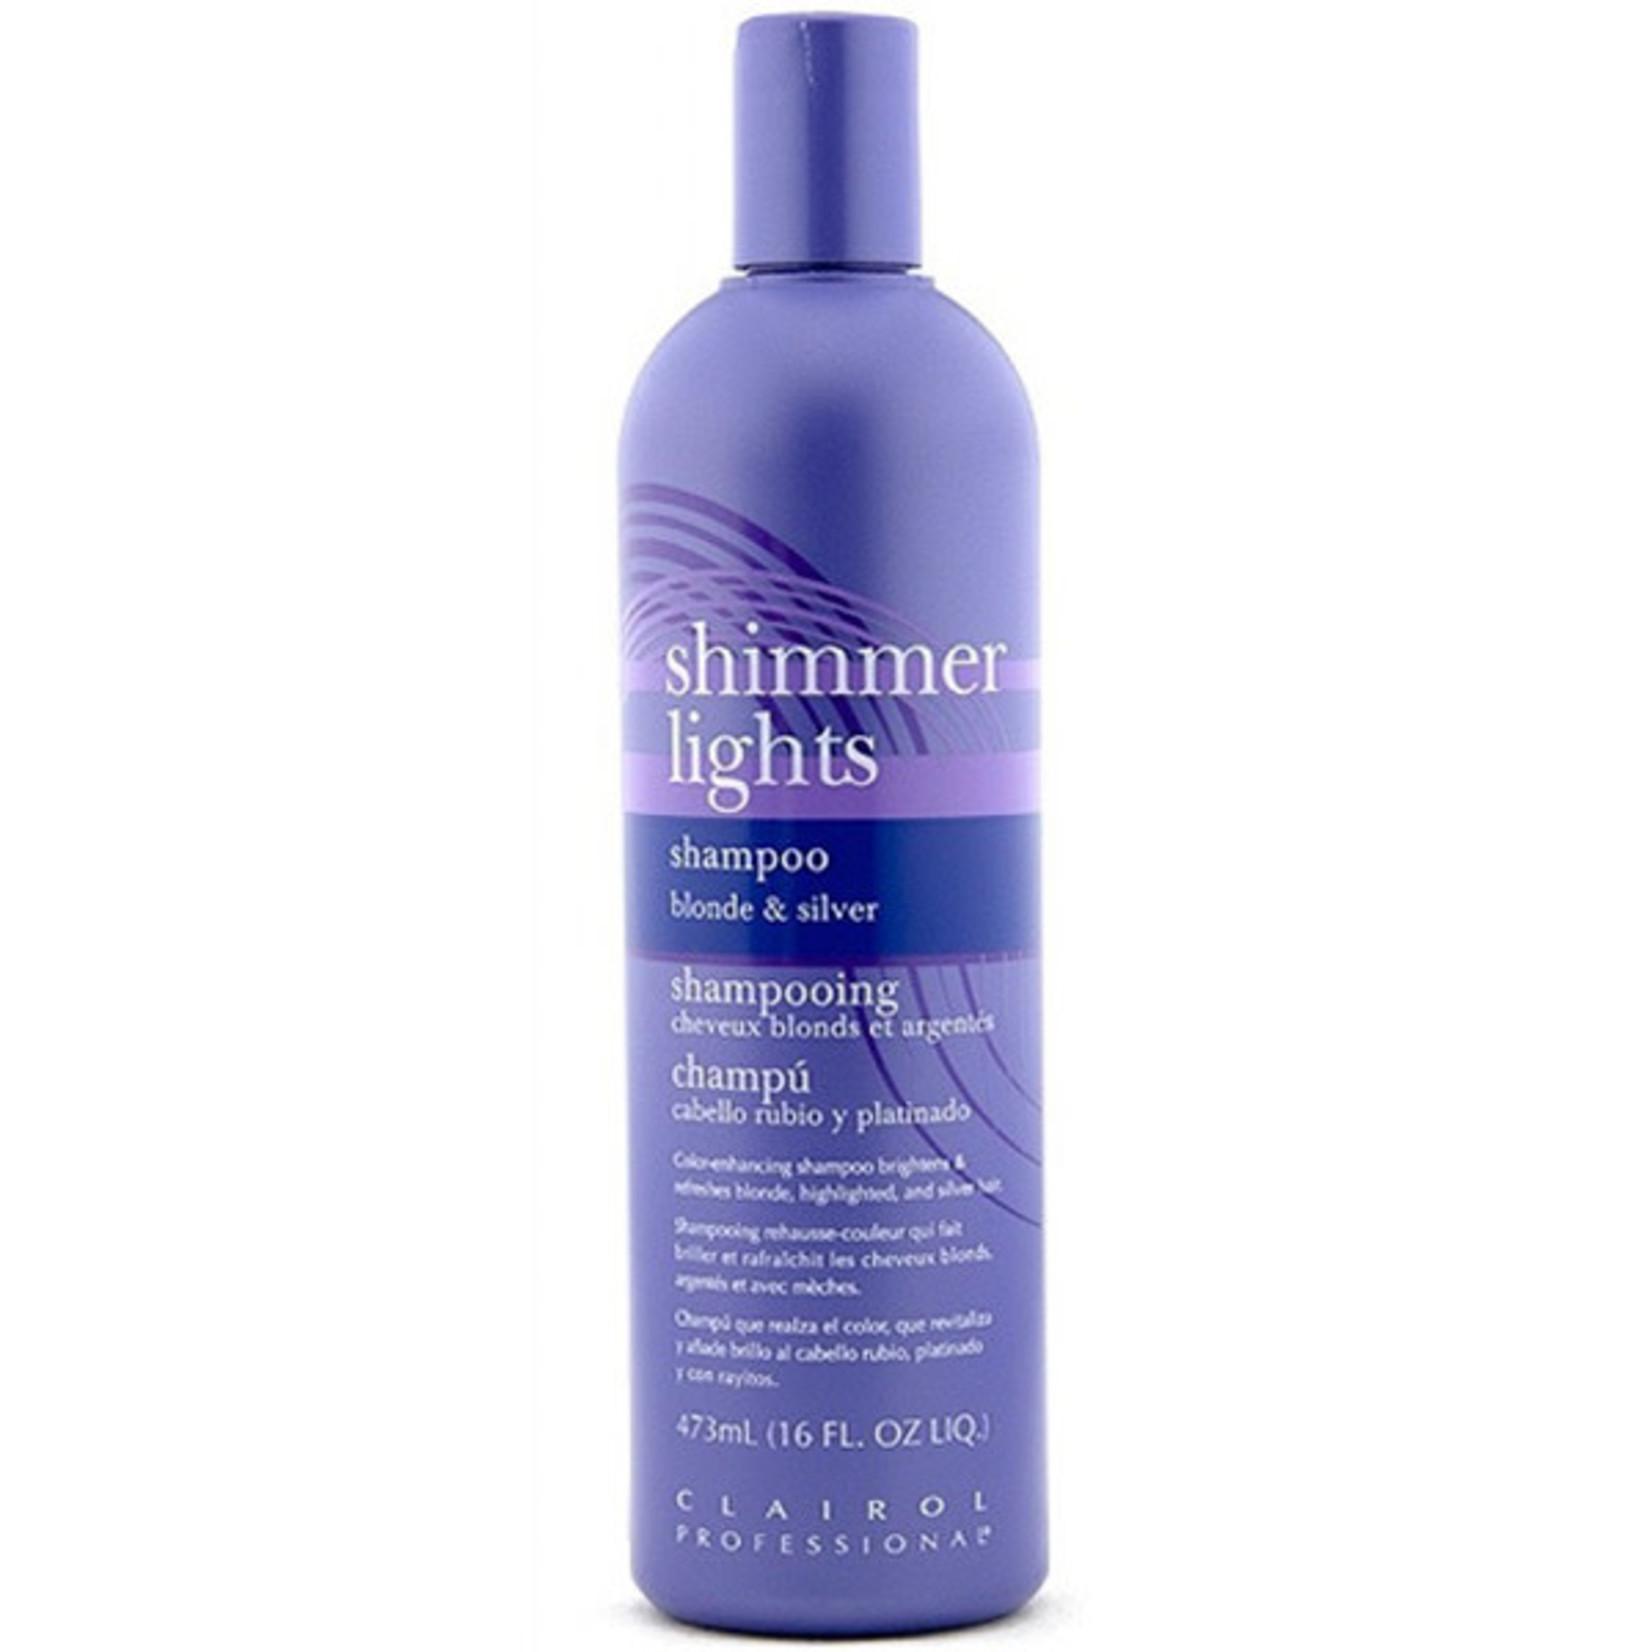 SHIMMER LIGHTS SHIMMER LIGHTS SHAMPOO [16OZ / 473mL]